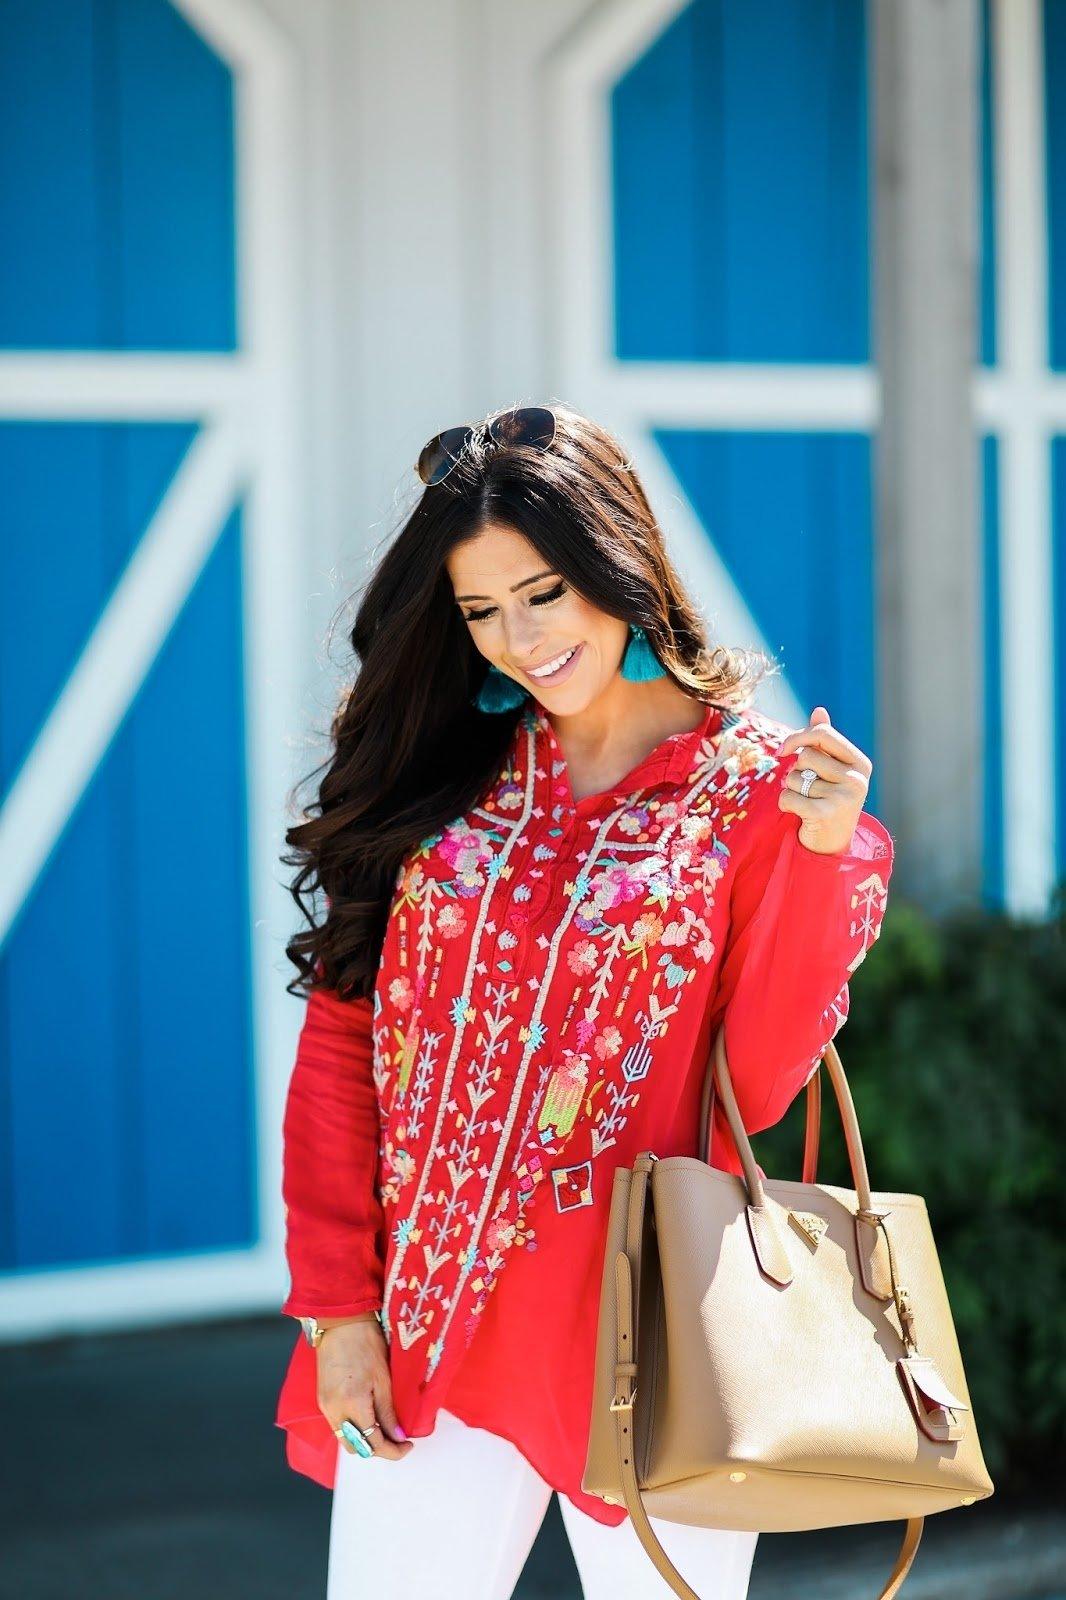 10 Attractive Cinco De Mayo Outfit Ideas cinco de mayo dresses ideas best dress 2017 2020